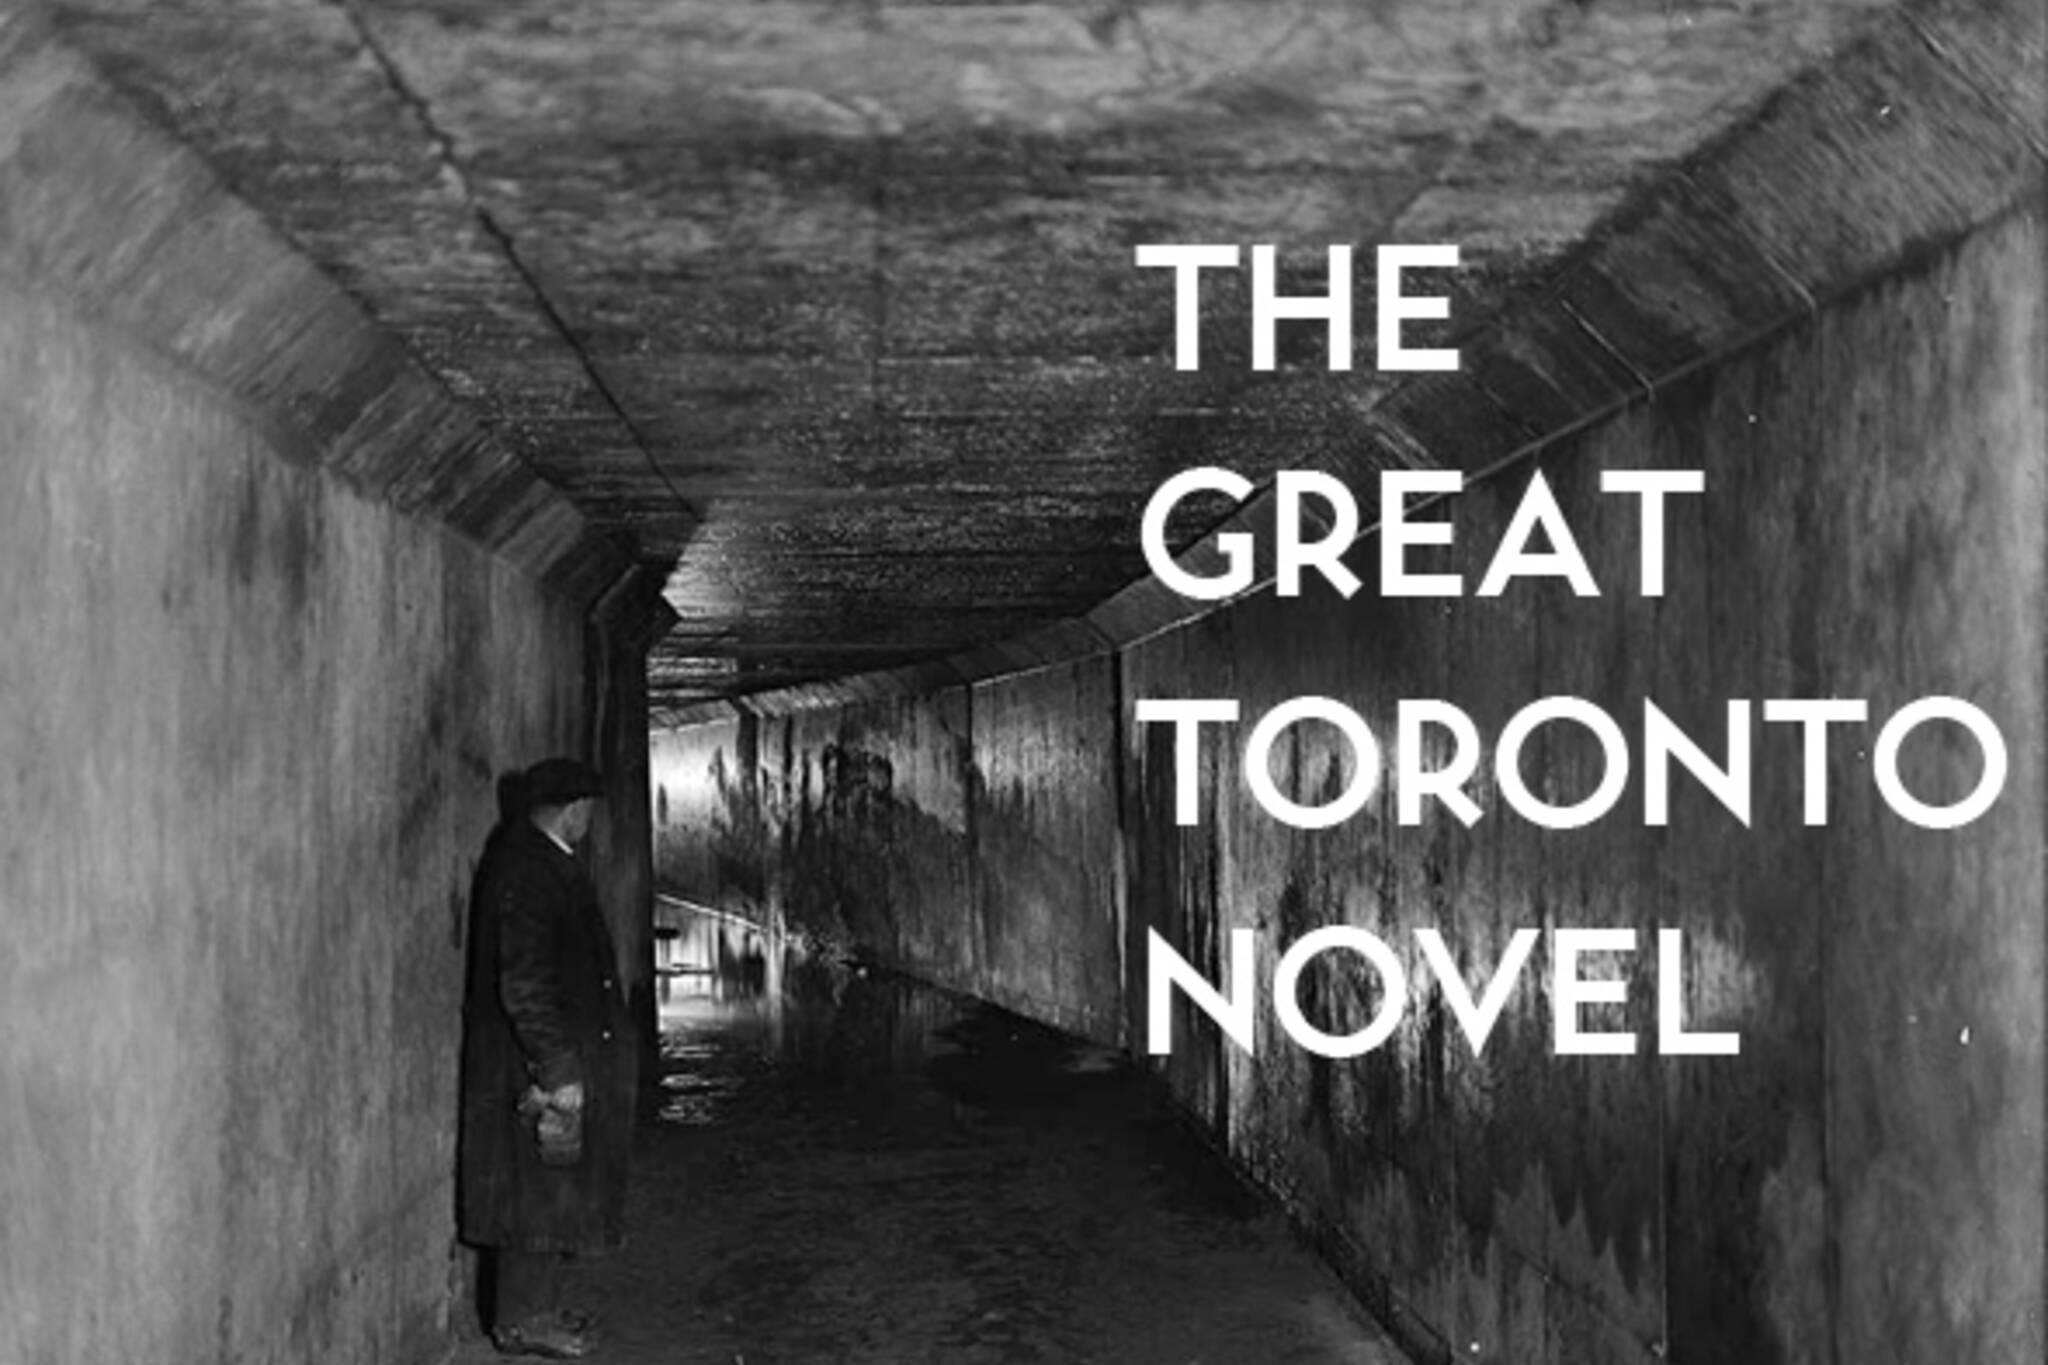 Top Toronto Novels